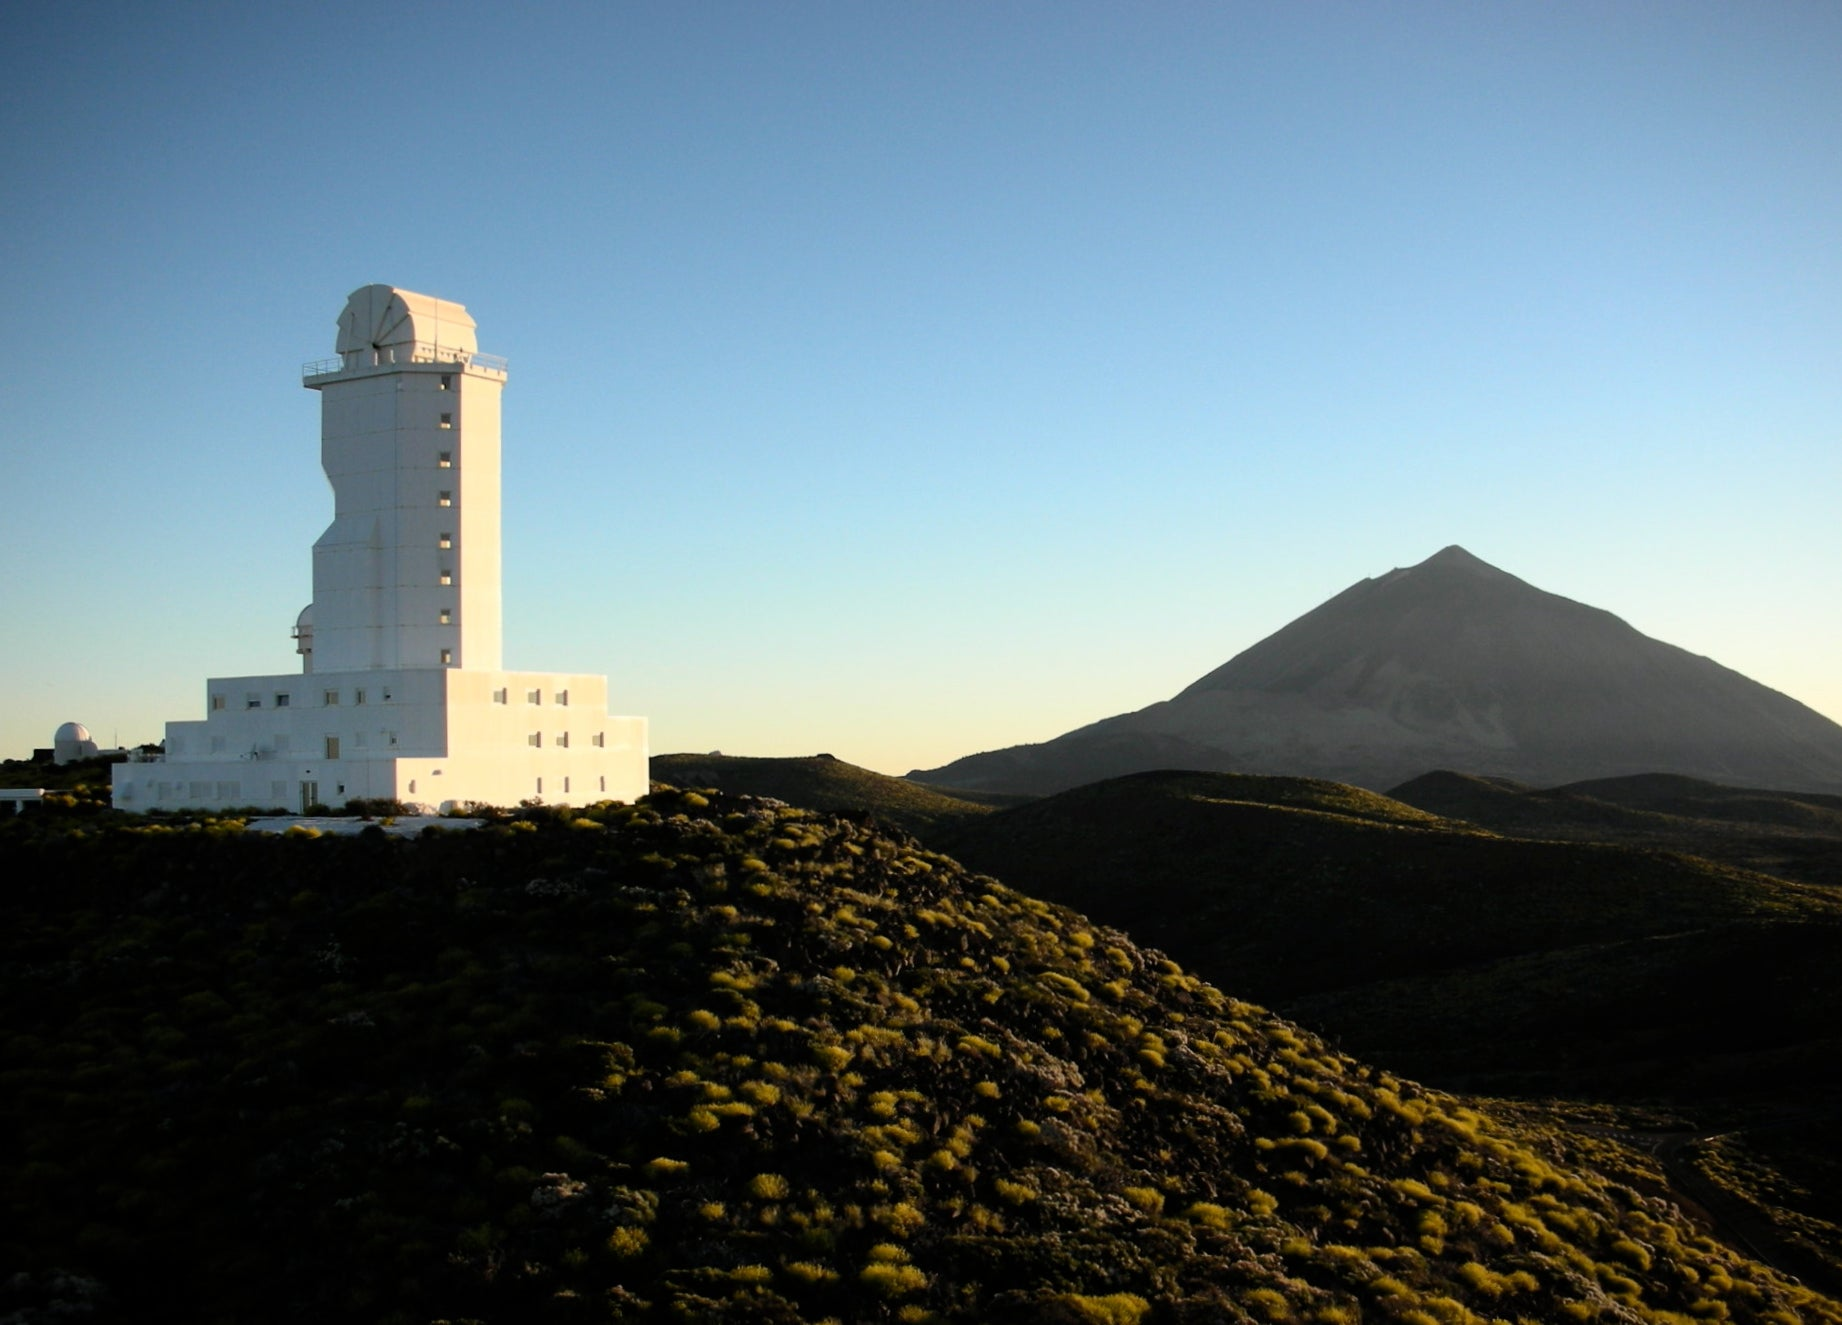 A Global Astronomy Social Network To Let Amateurs Peep Through Robotic Telescopes